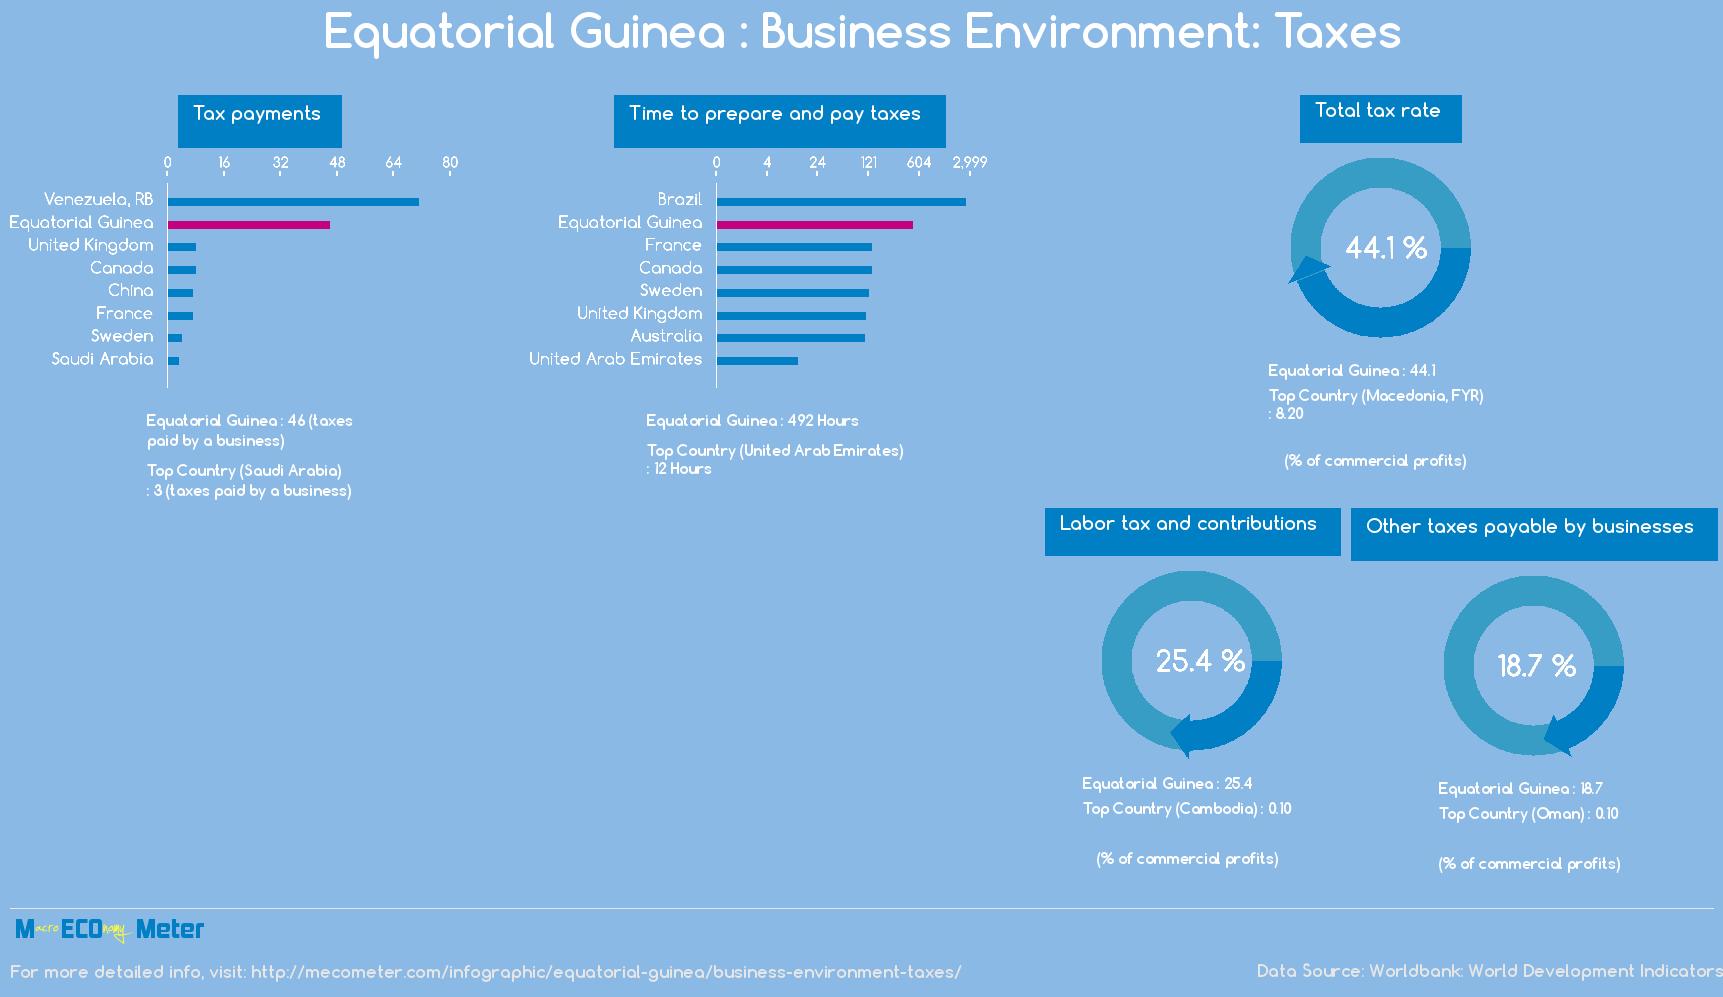 Equatorial Guinea : Business Environment: Taxes